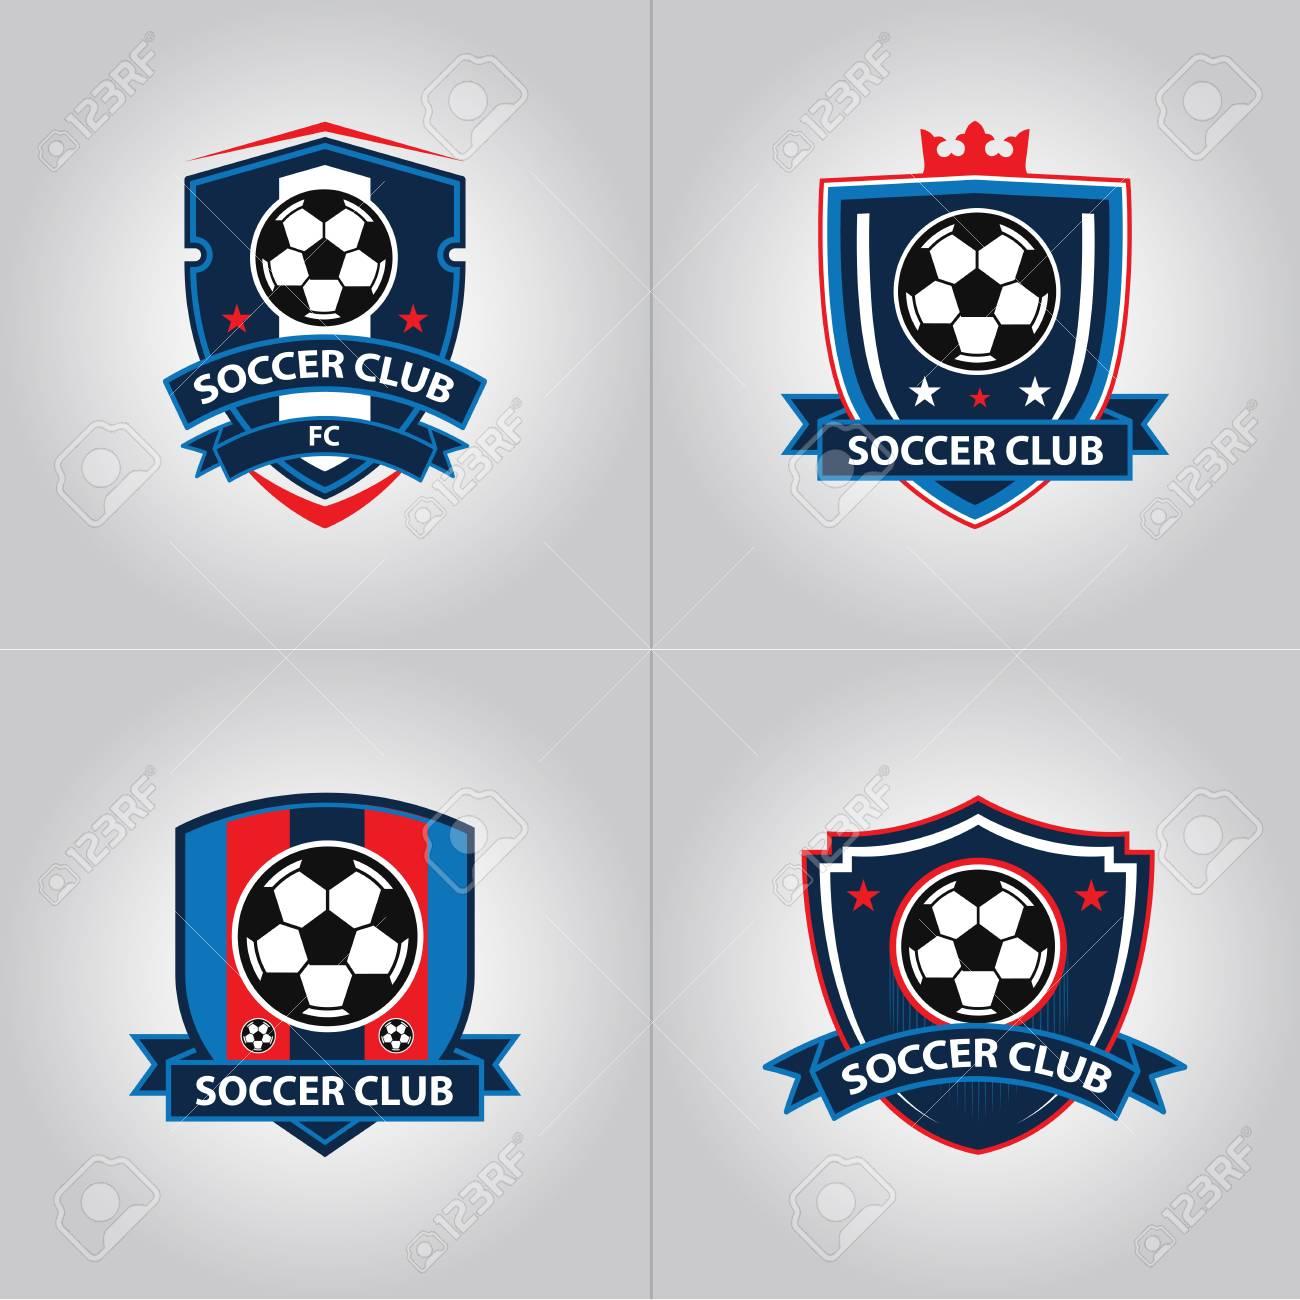 Soccer Football Badge Logo Design Templates | Sport Team Identity Vector Illustrations isolated on blue Background - 120477433